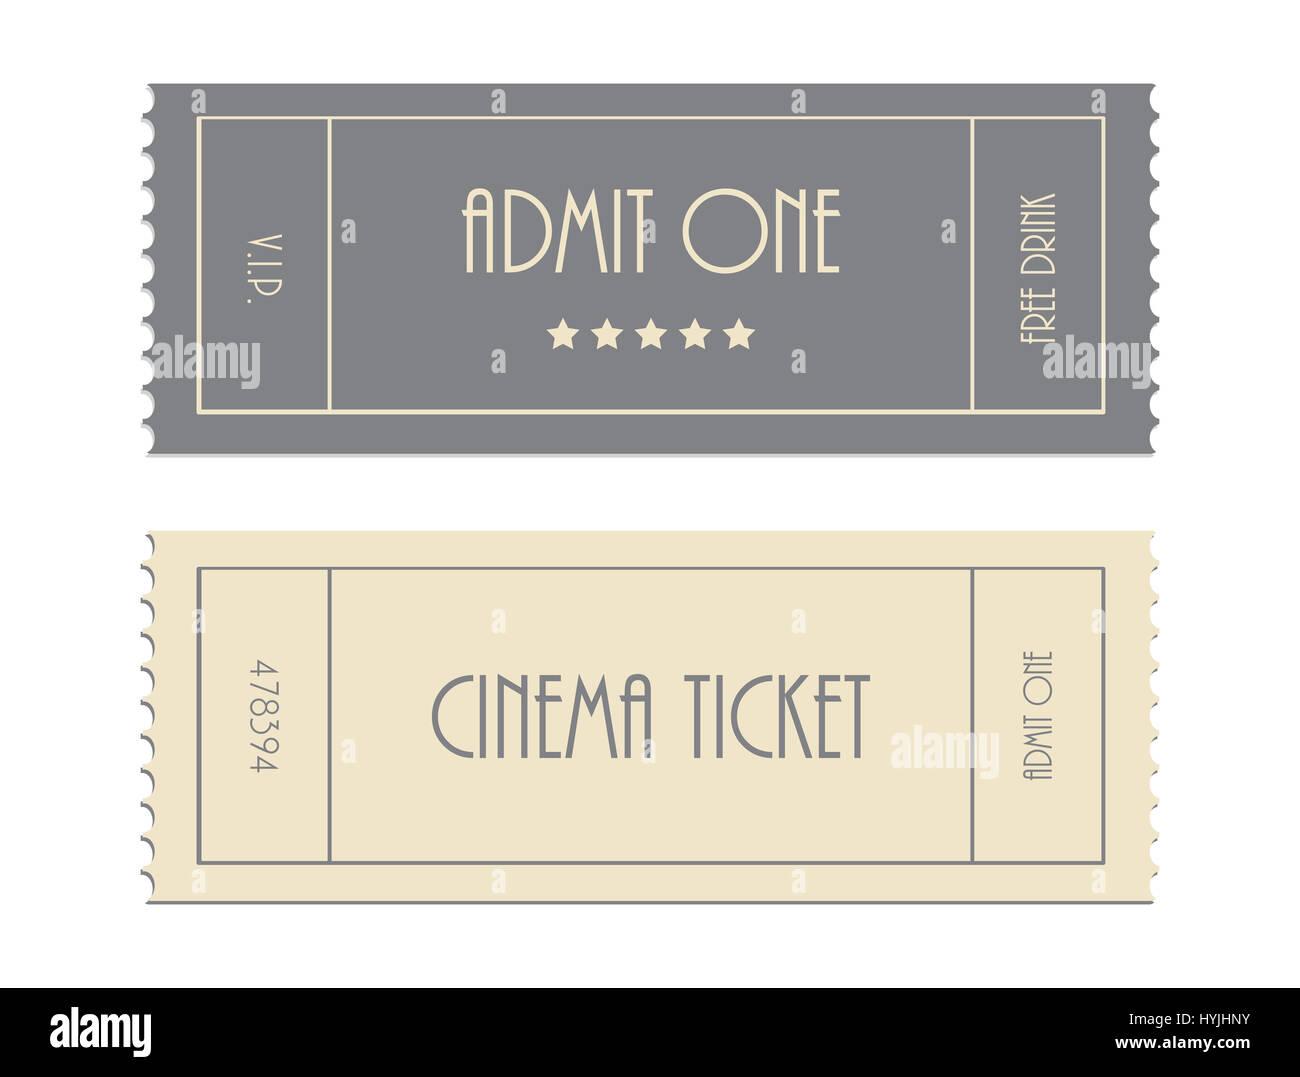 Cinema Ticket Stock Photos & Cinema Ticket Stock Images - Alamy